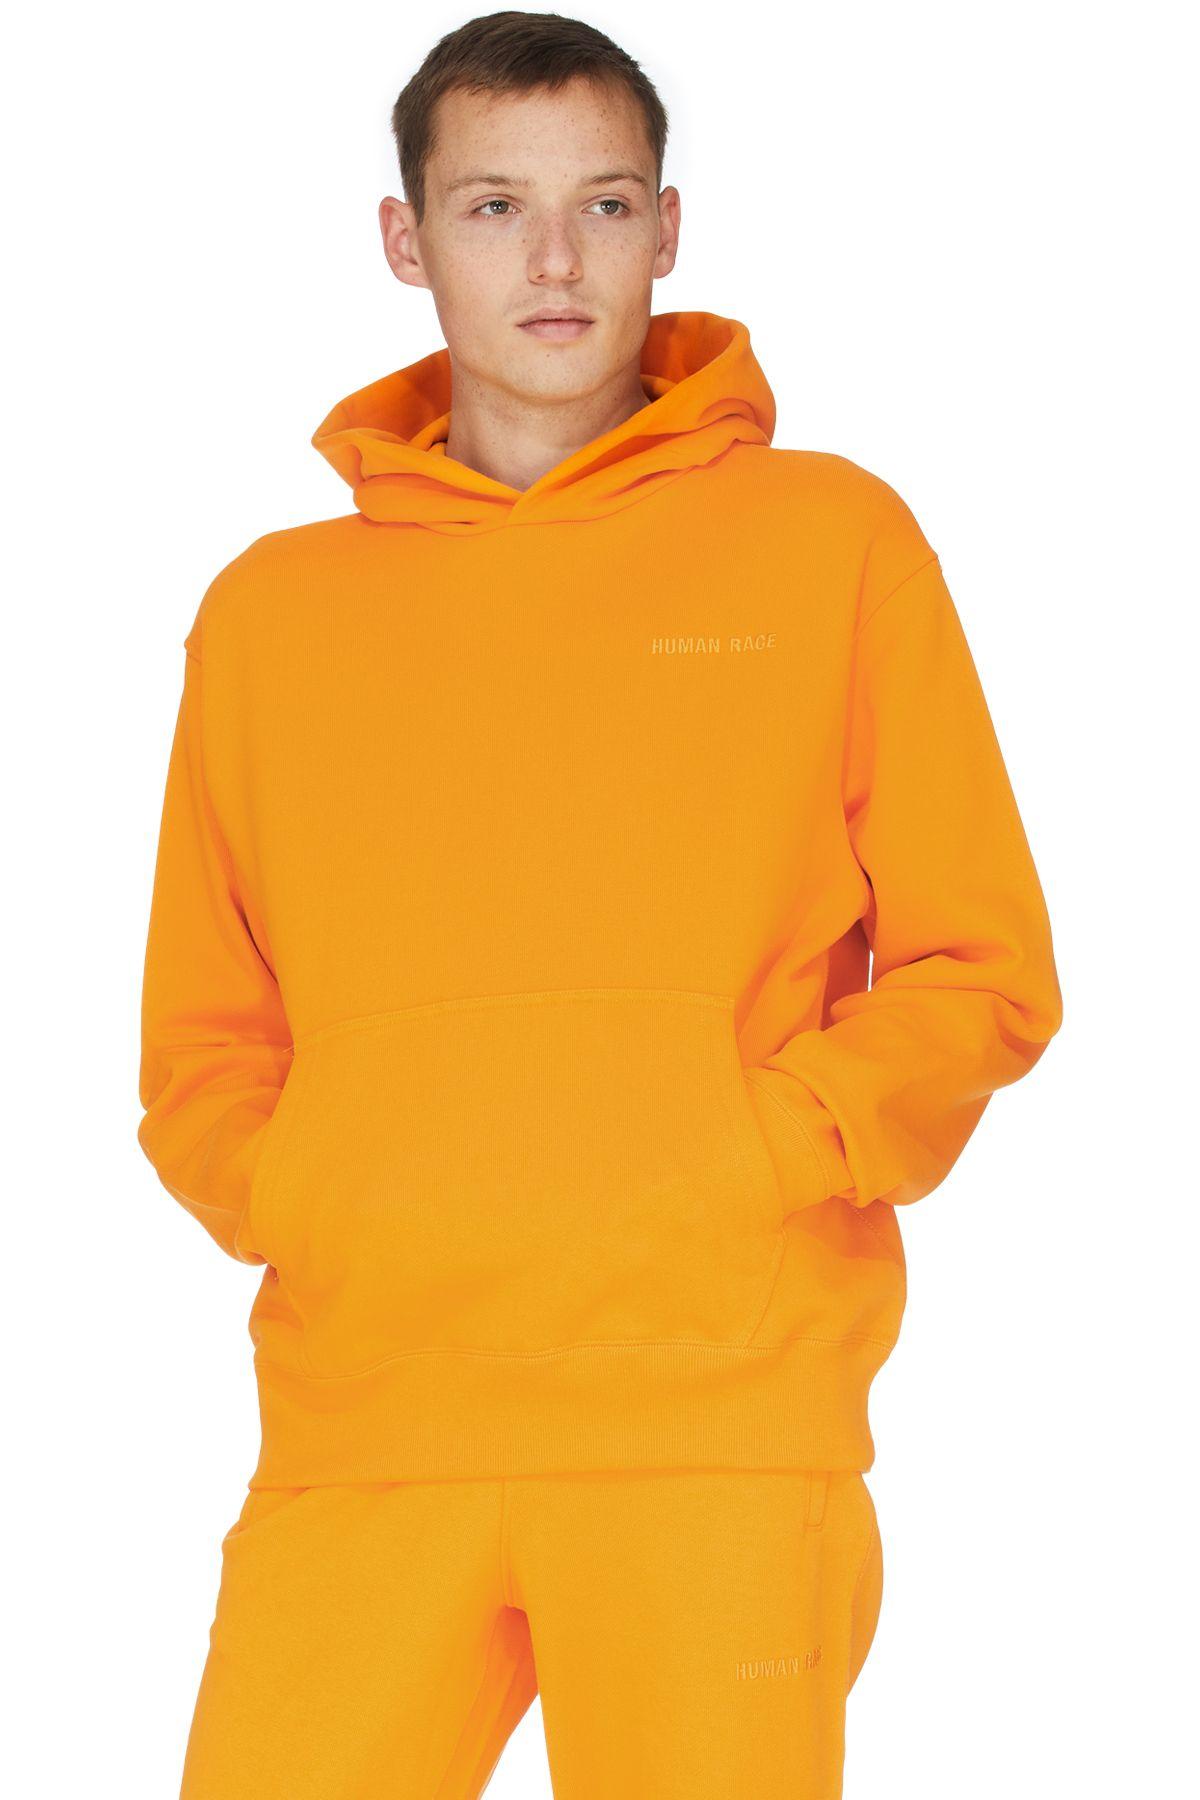 Adidas Originals X Pharrell Williams Pharrell Williams Basics Hoodie Bright Orange Orange Outfit Pharrell Williams Monochromatic Outfit [ 1800 x 1200 Pixel ]